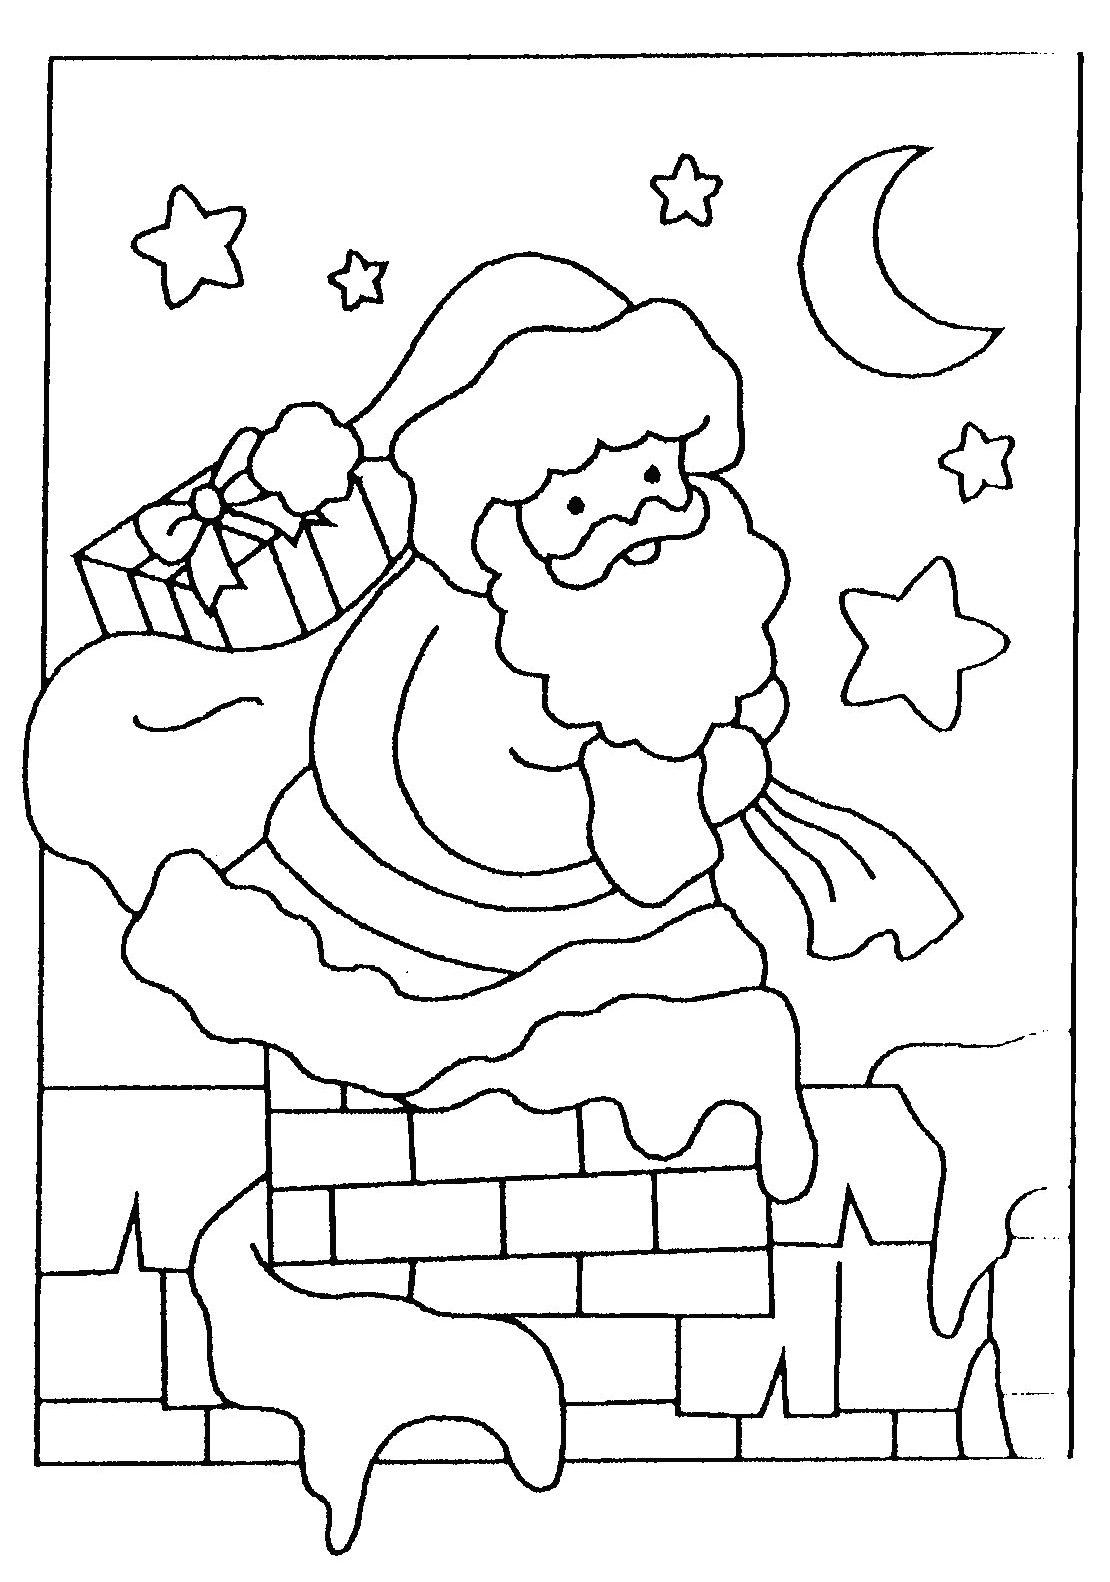 Coloriages De Noel Un Beau Noel